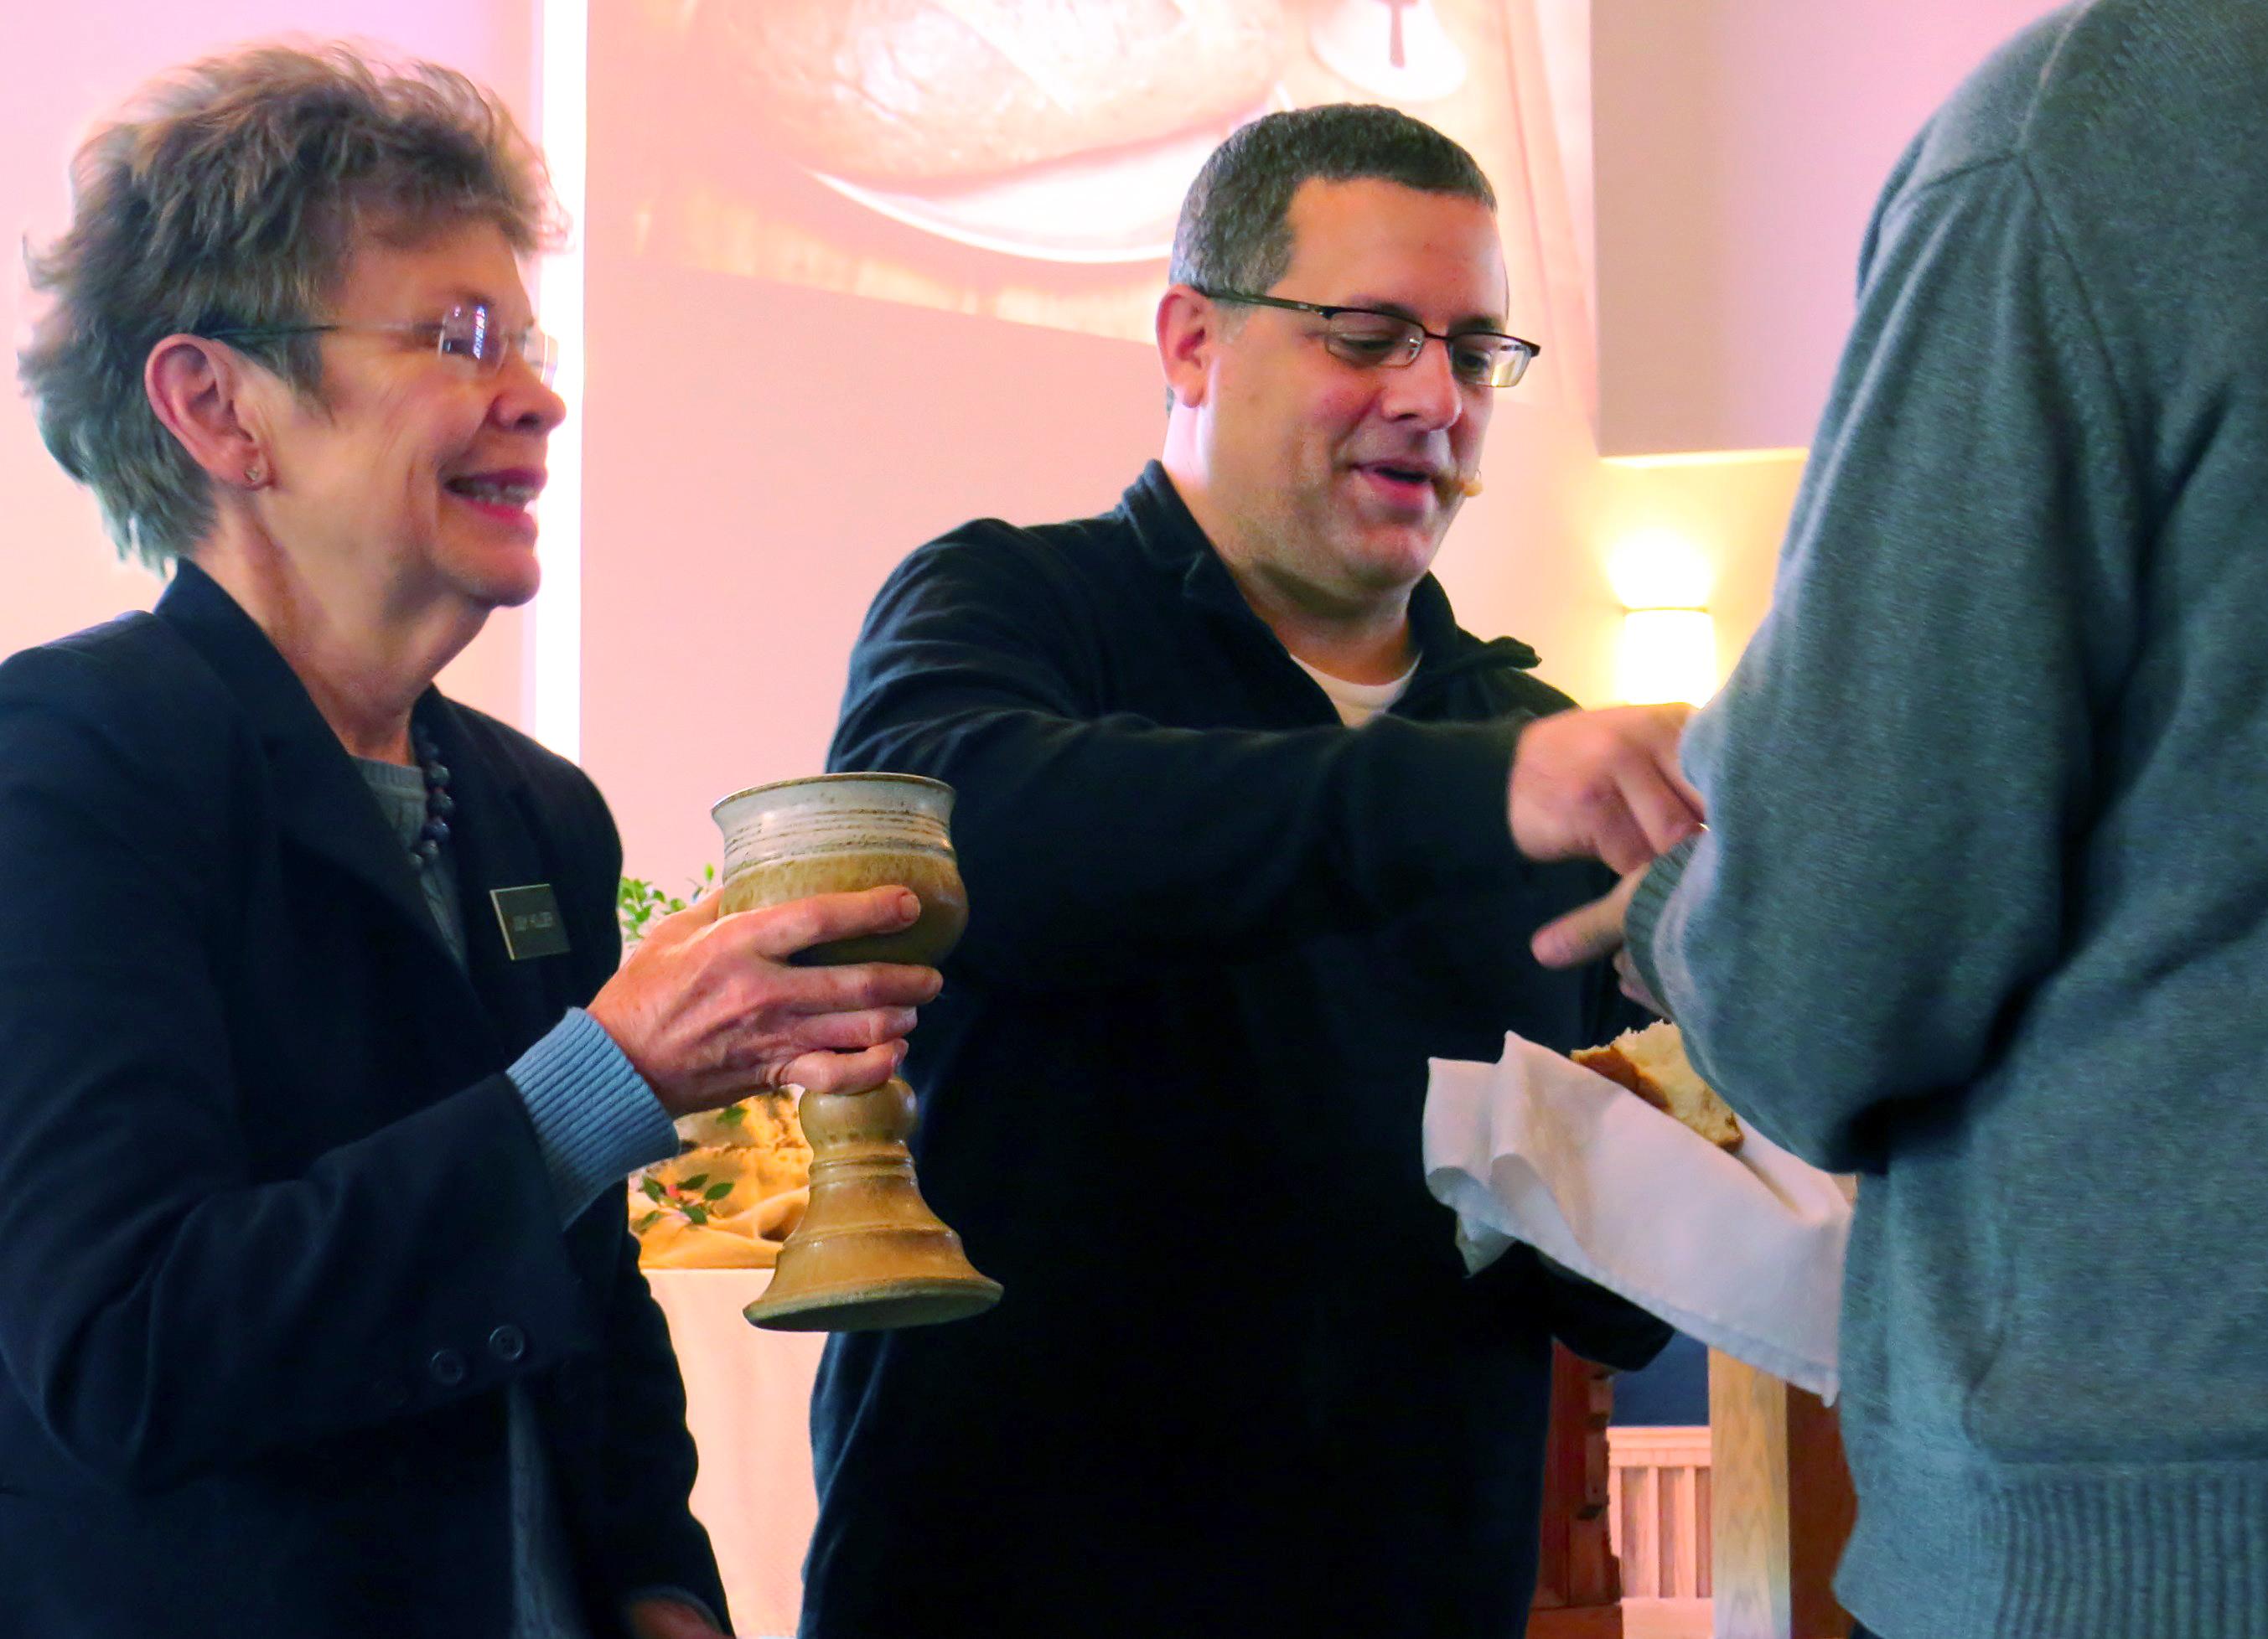 The Rev. Omar Rikabi offers communion on Jan. 17 at First United Methodist Church in Heath, Texas. UMNS photo by Sam Hodges